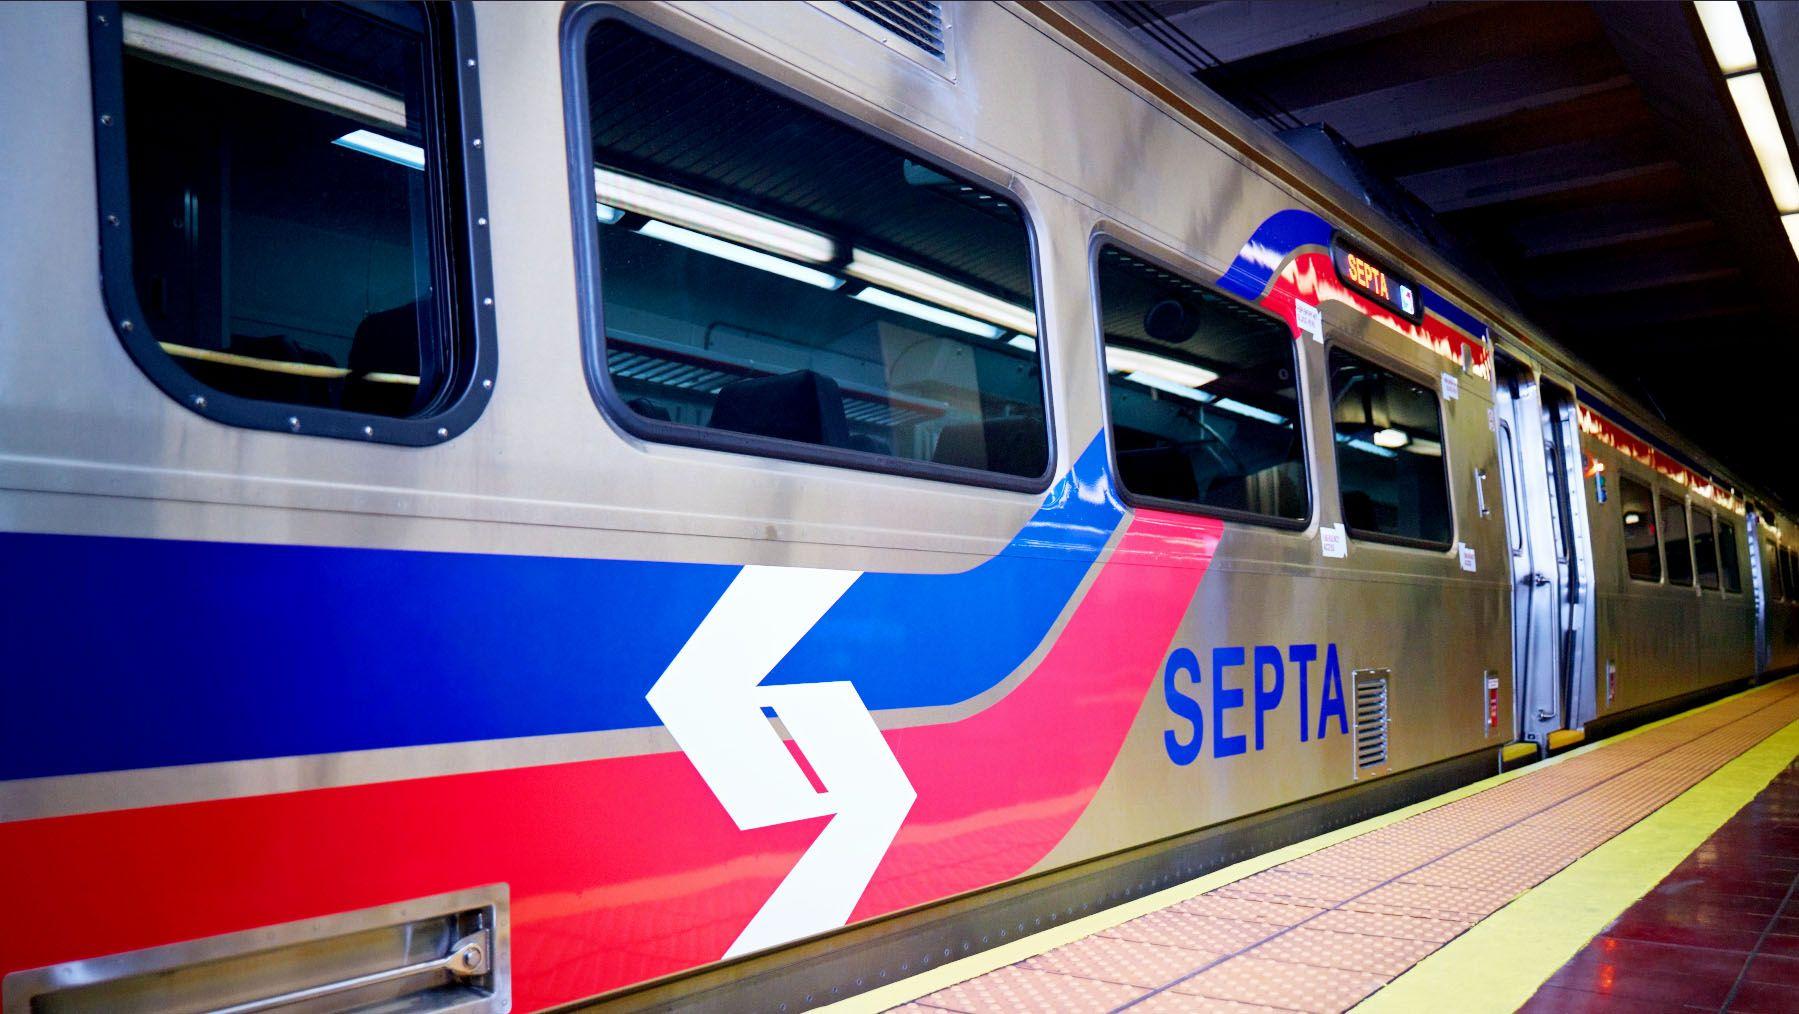 SEPTA awarded for customer service, green initiatives